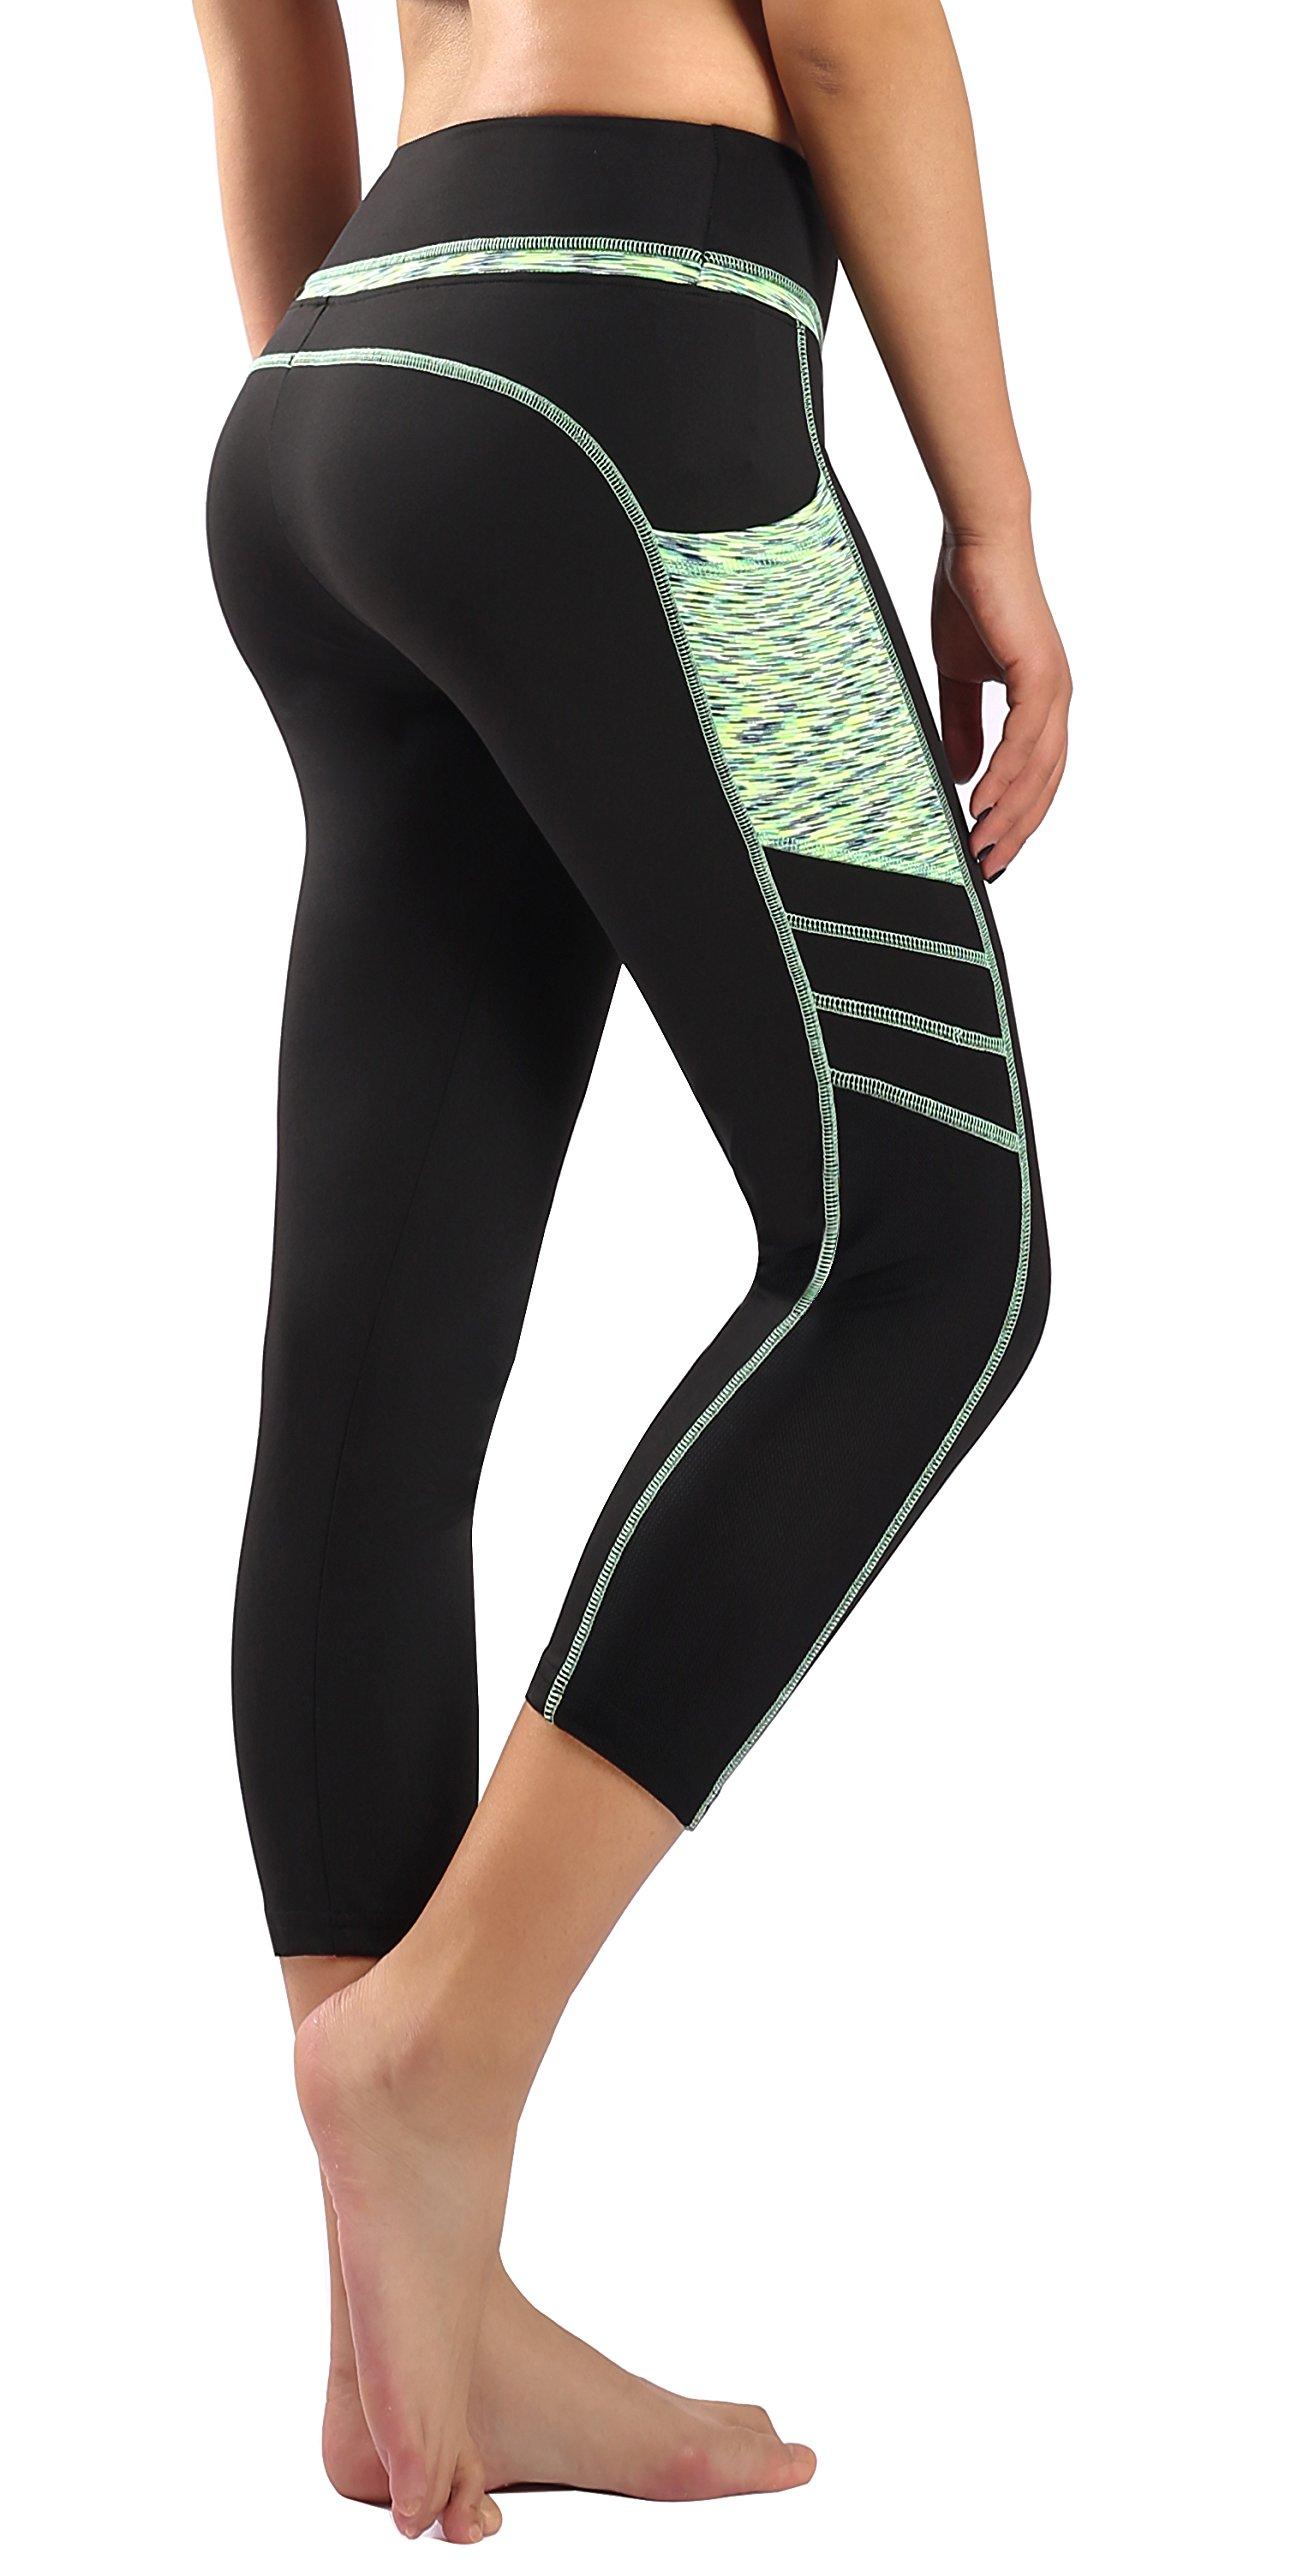 Sugar Pocket Legging de Sport Femme Stretch Yoga Jogging Fitness Running  Taille Haute avec Poche cdac79d208e